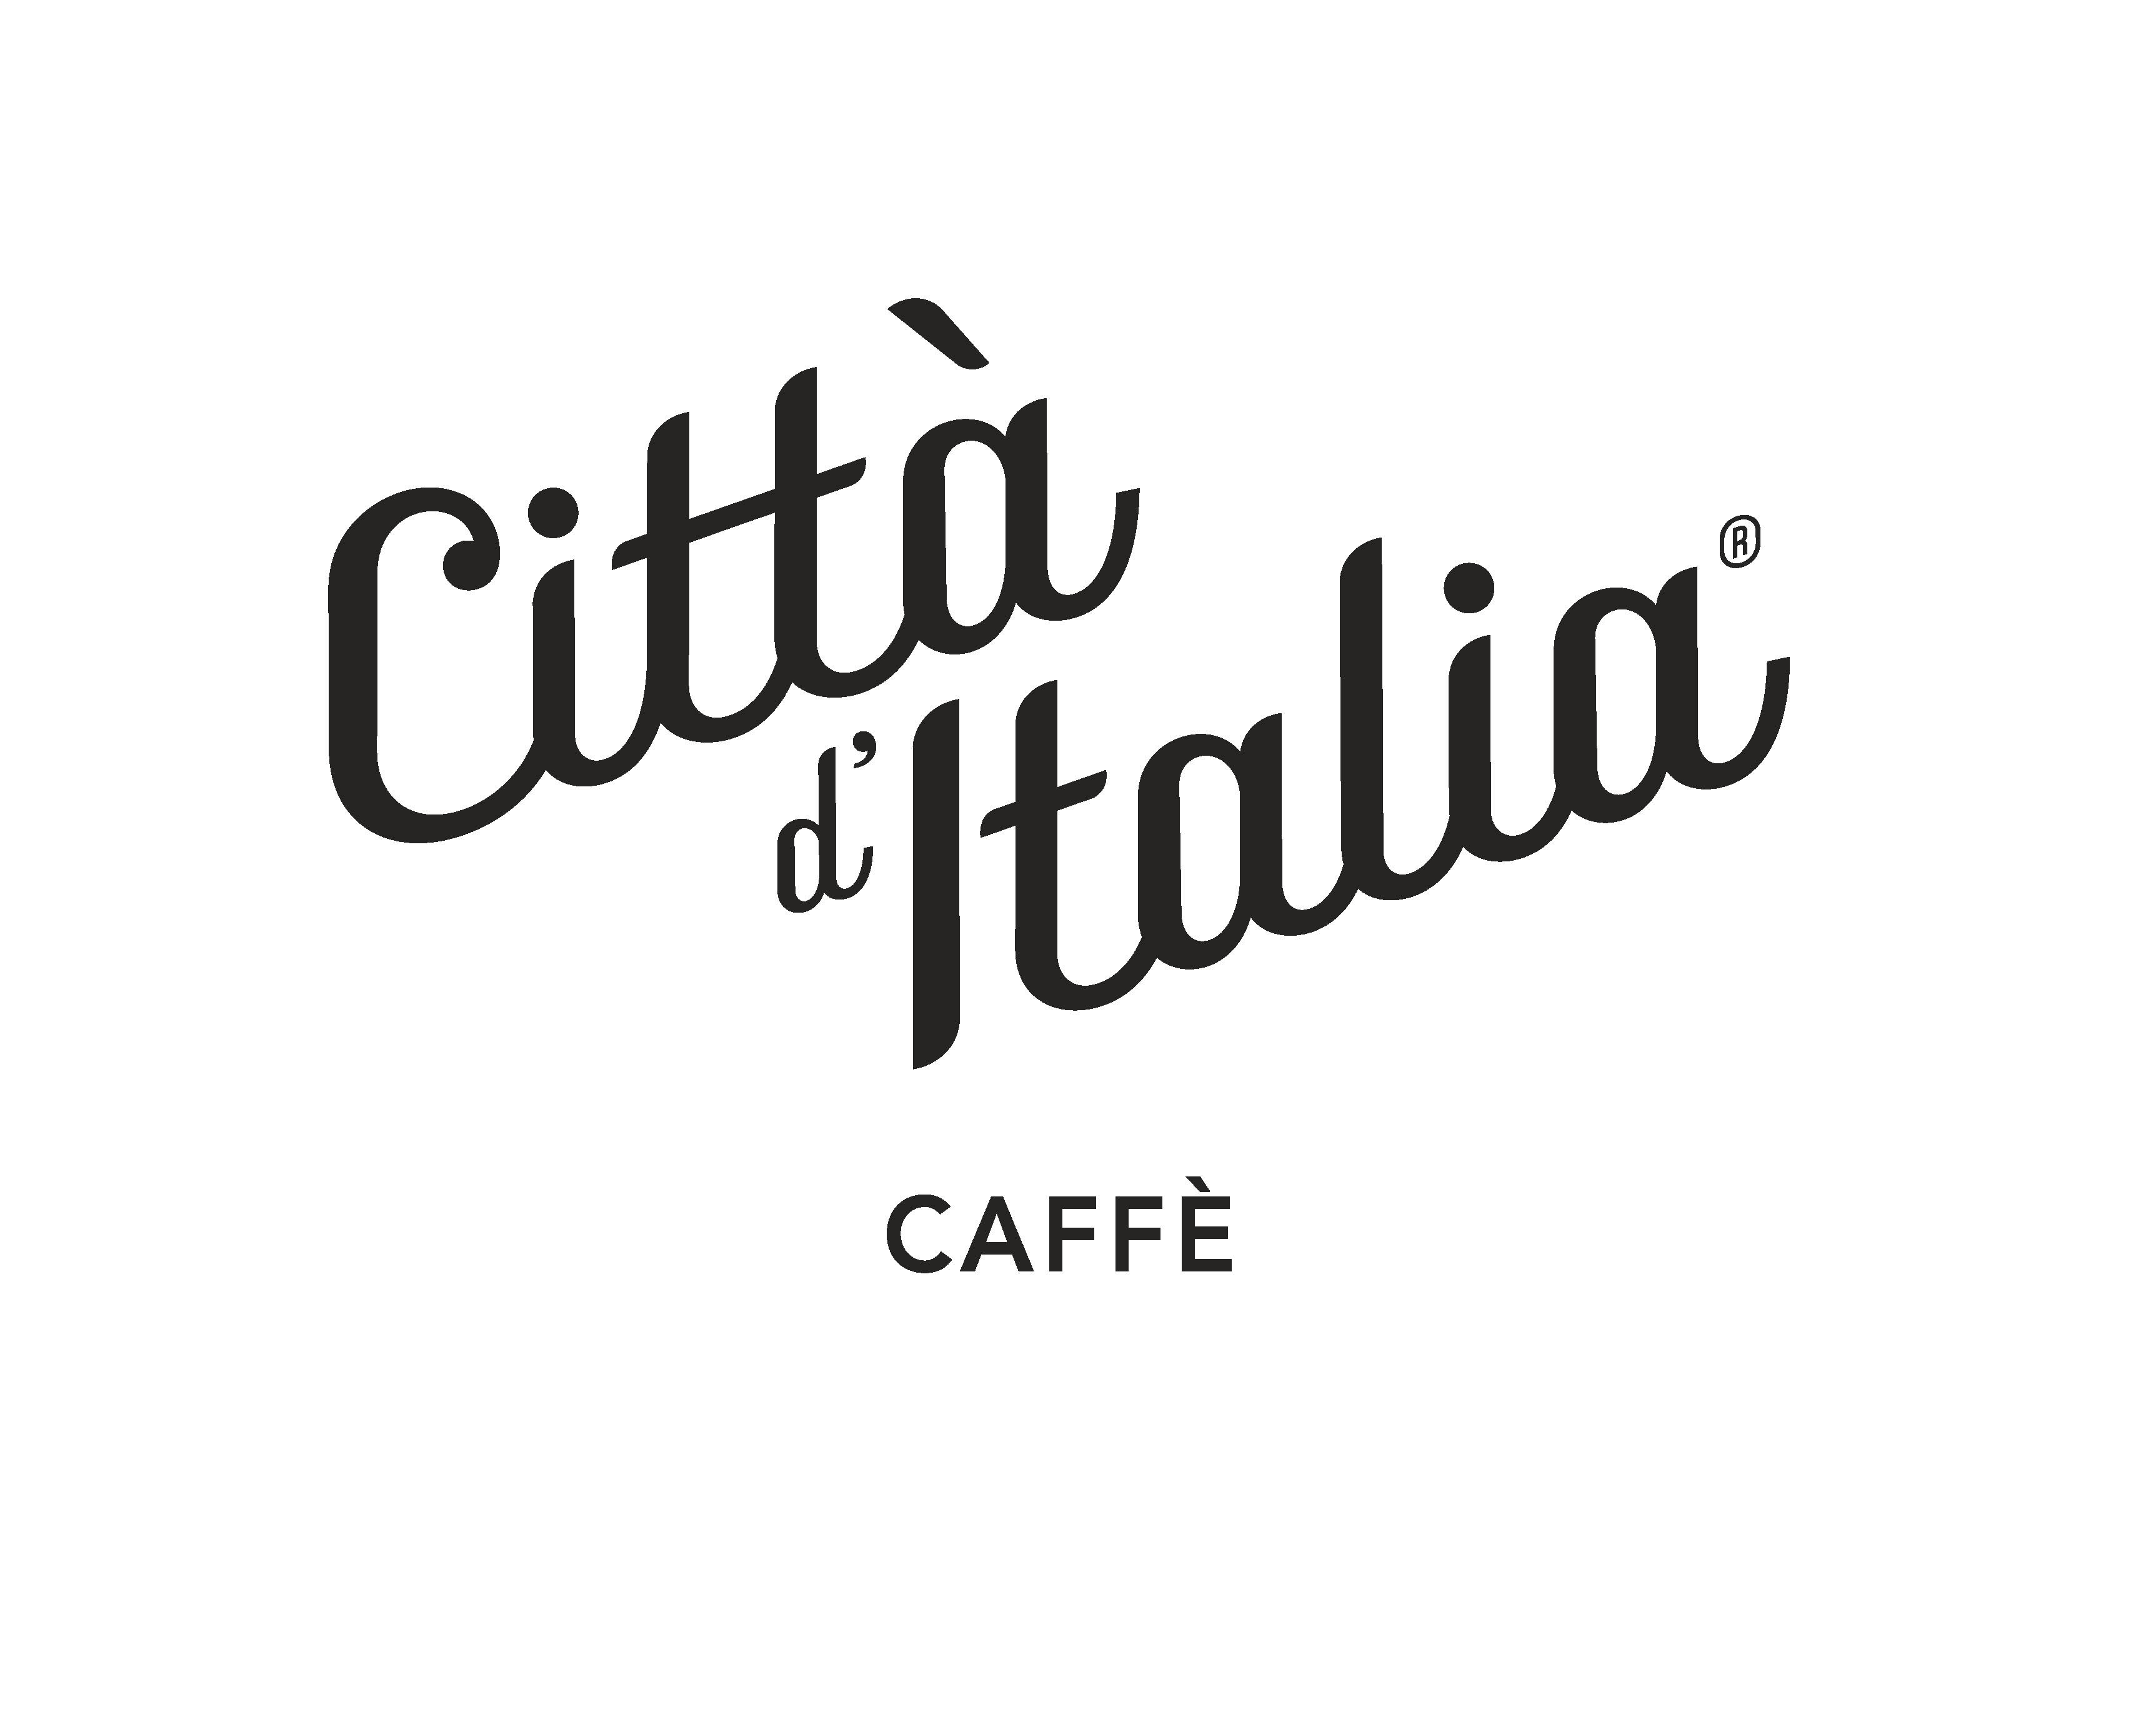 Città d'Italia by LaMessicana